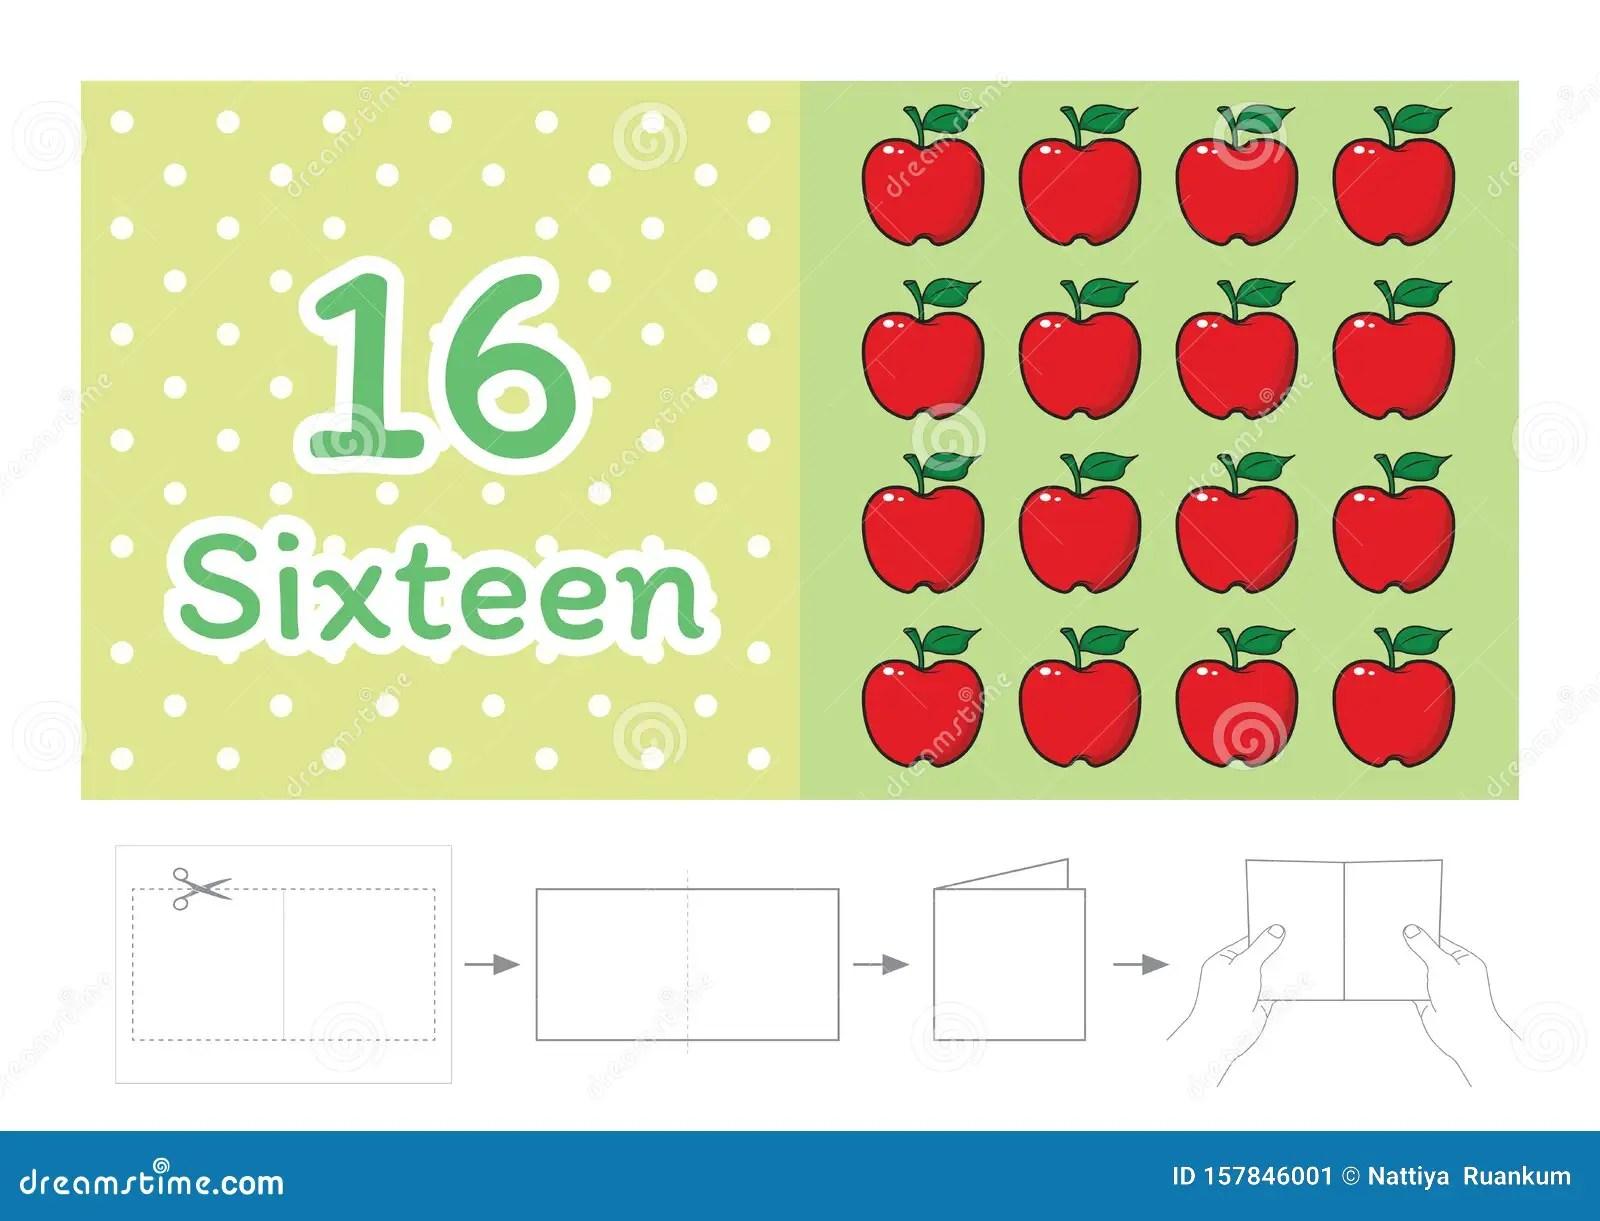 Worksheet For Kindergarten Kids Count The Number Of